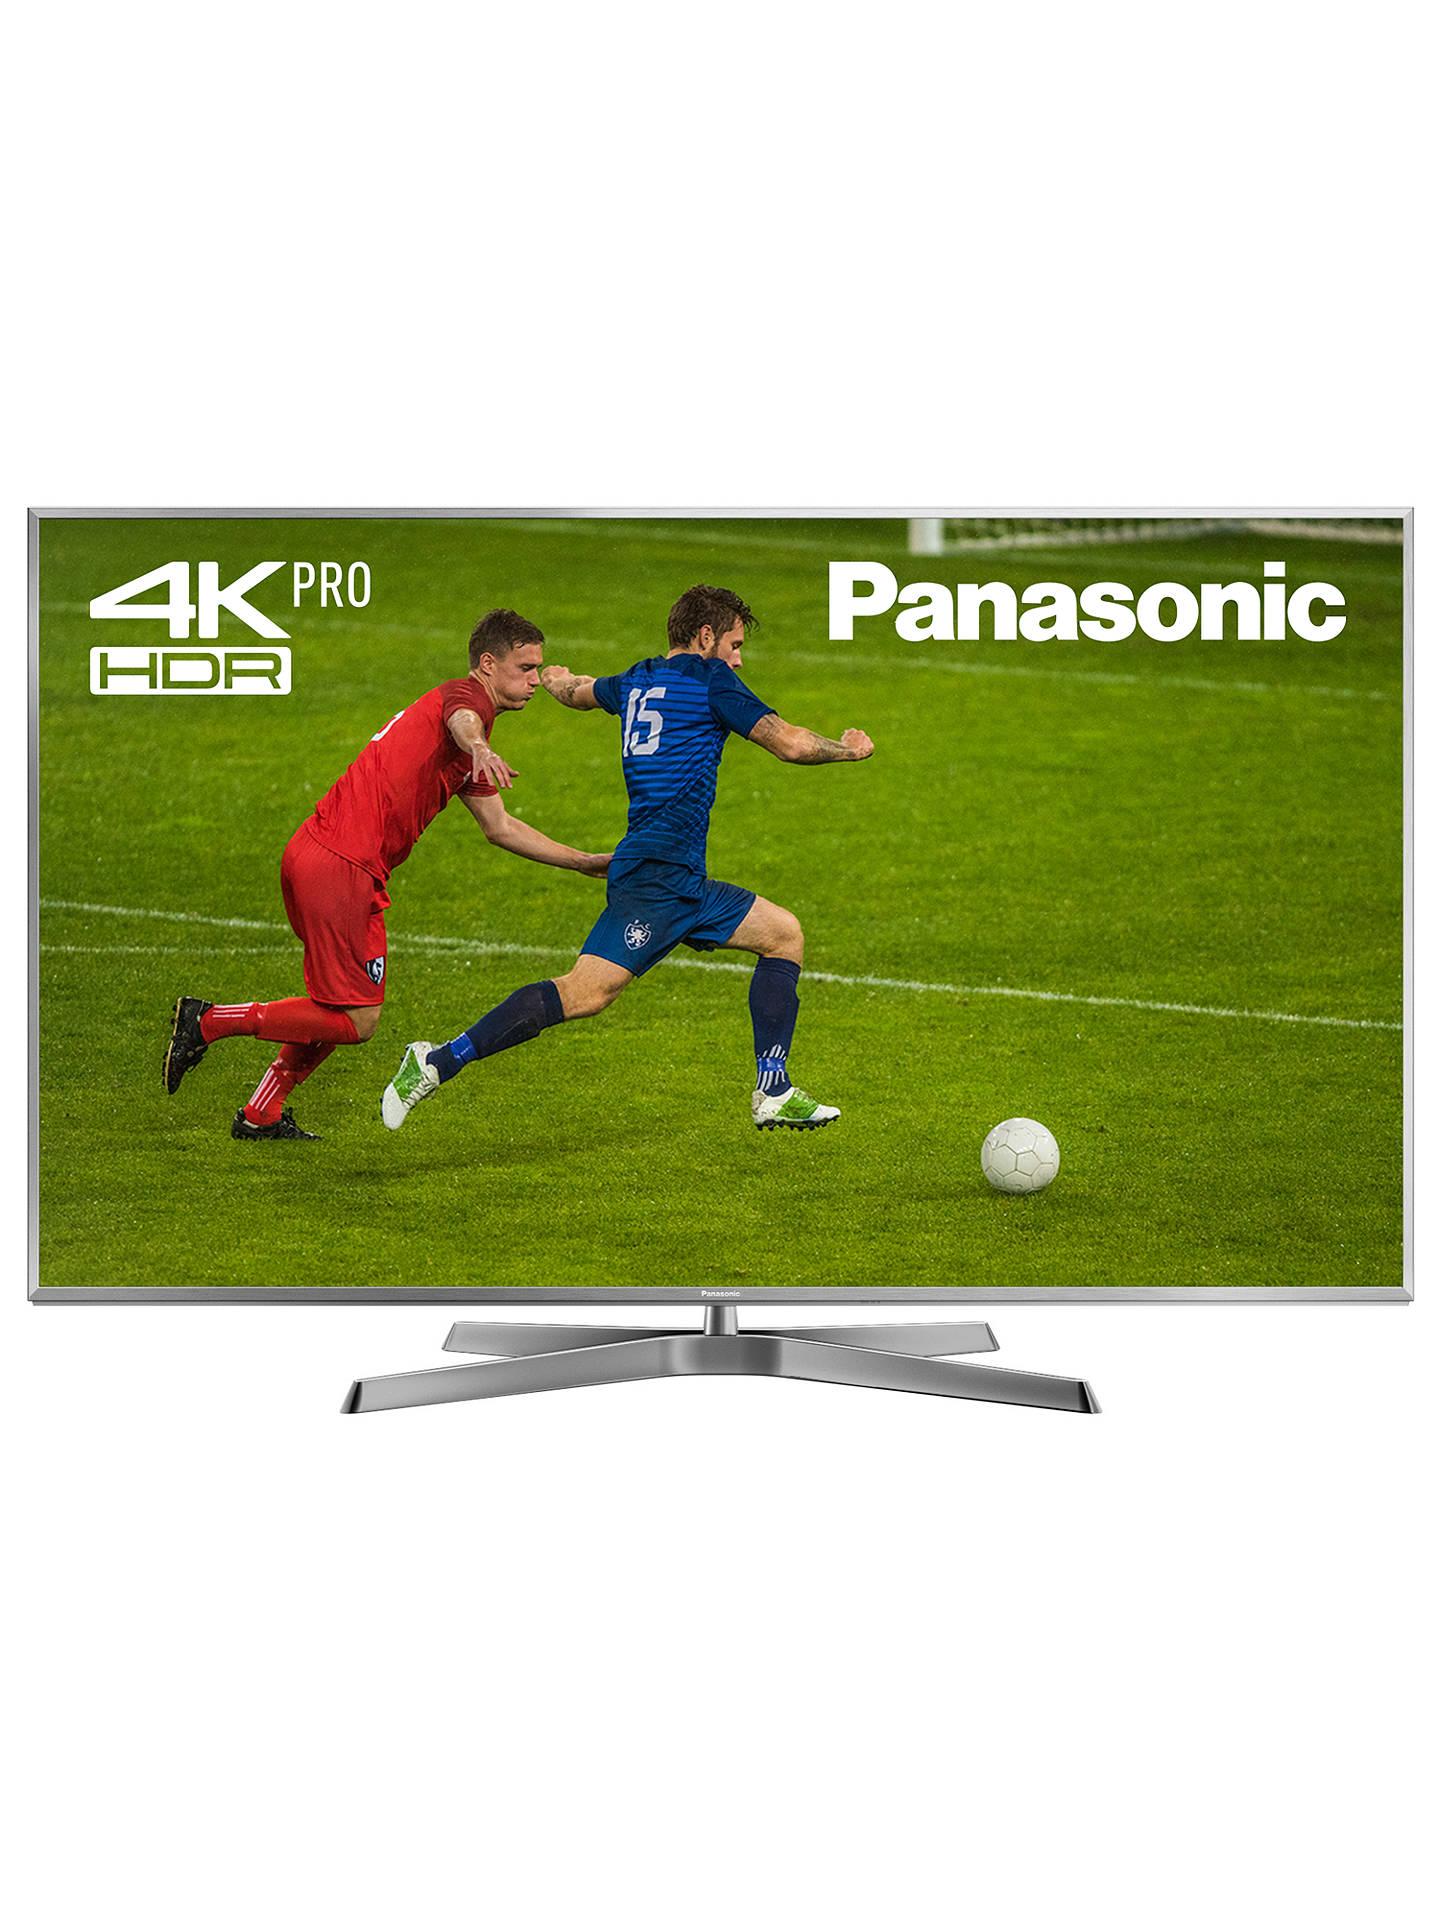 Panasonic TX-50EX750B LED HDR 4K Ultra HD 3D Smart TV, 50